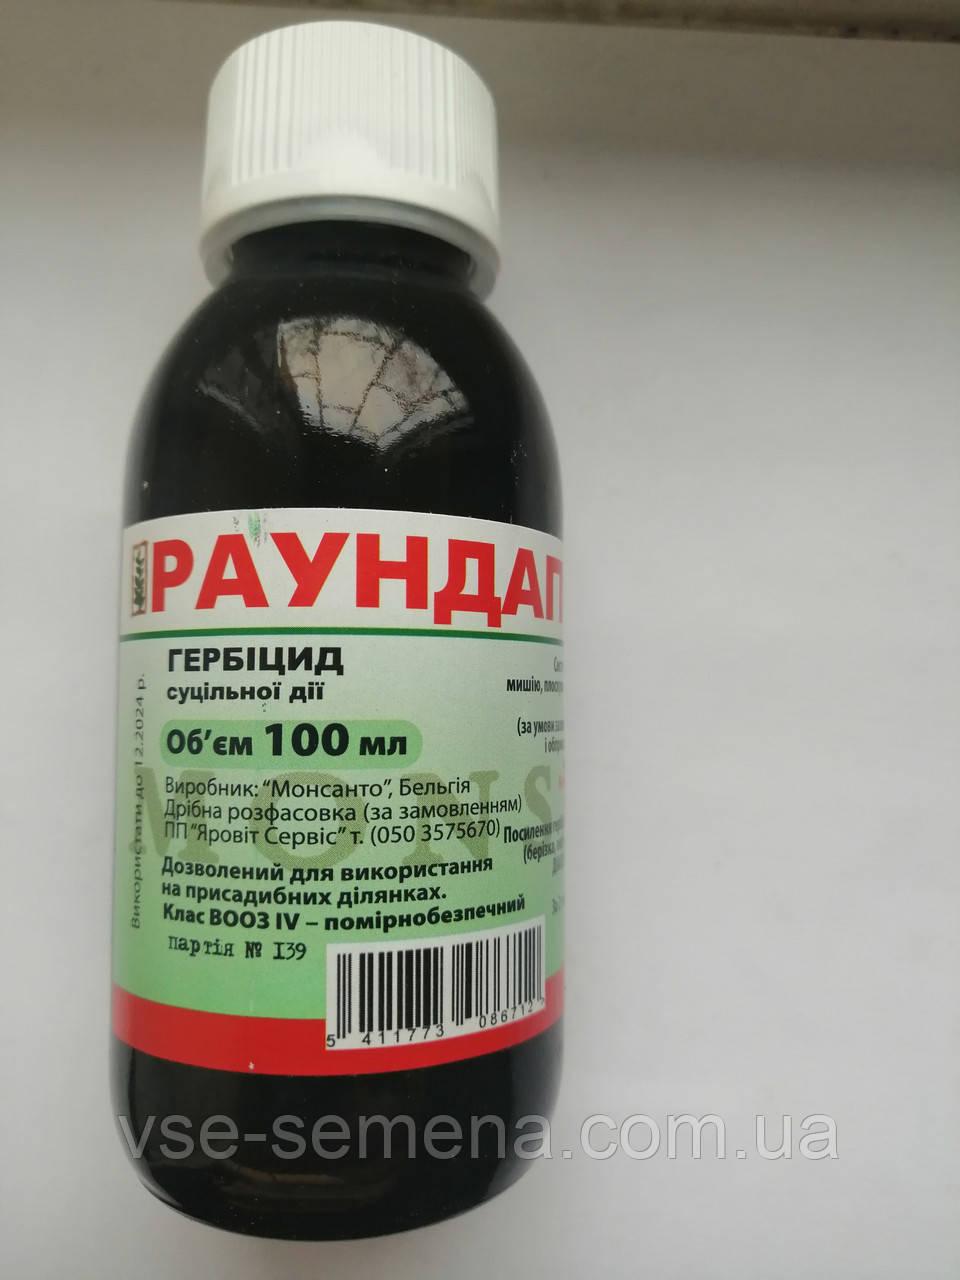 Раундап 100 мл, гербицид